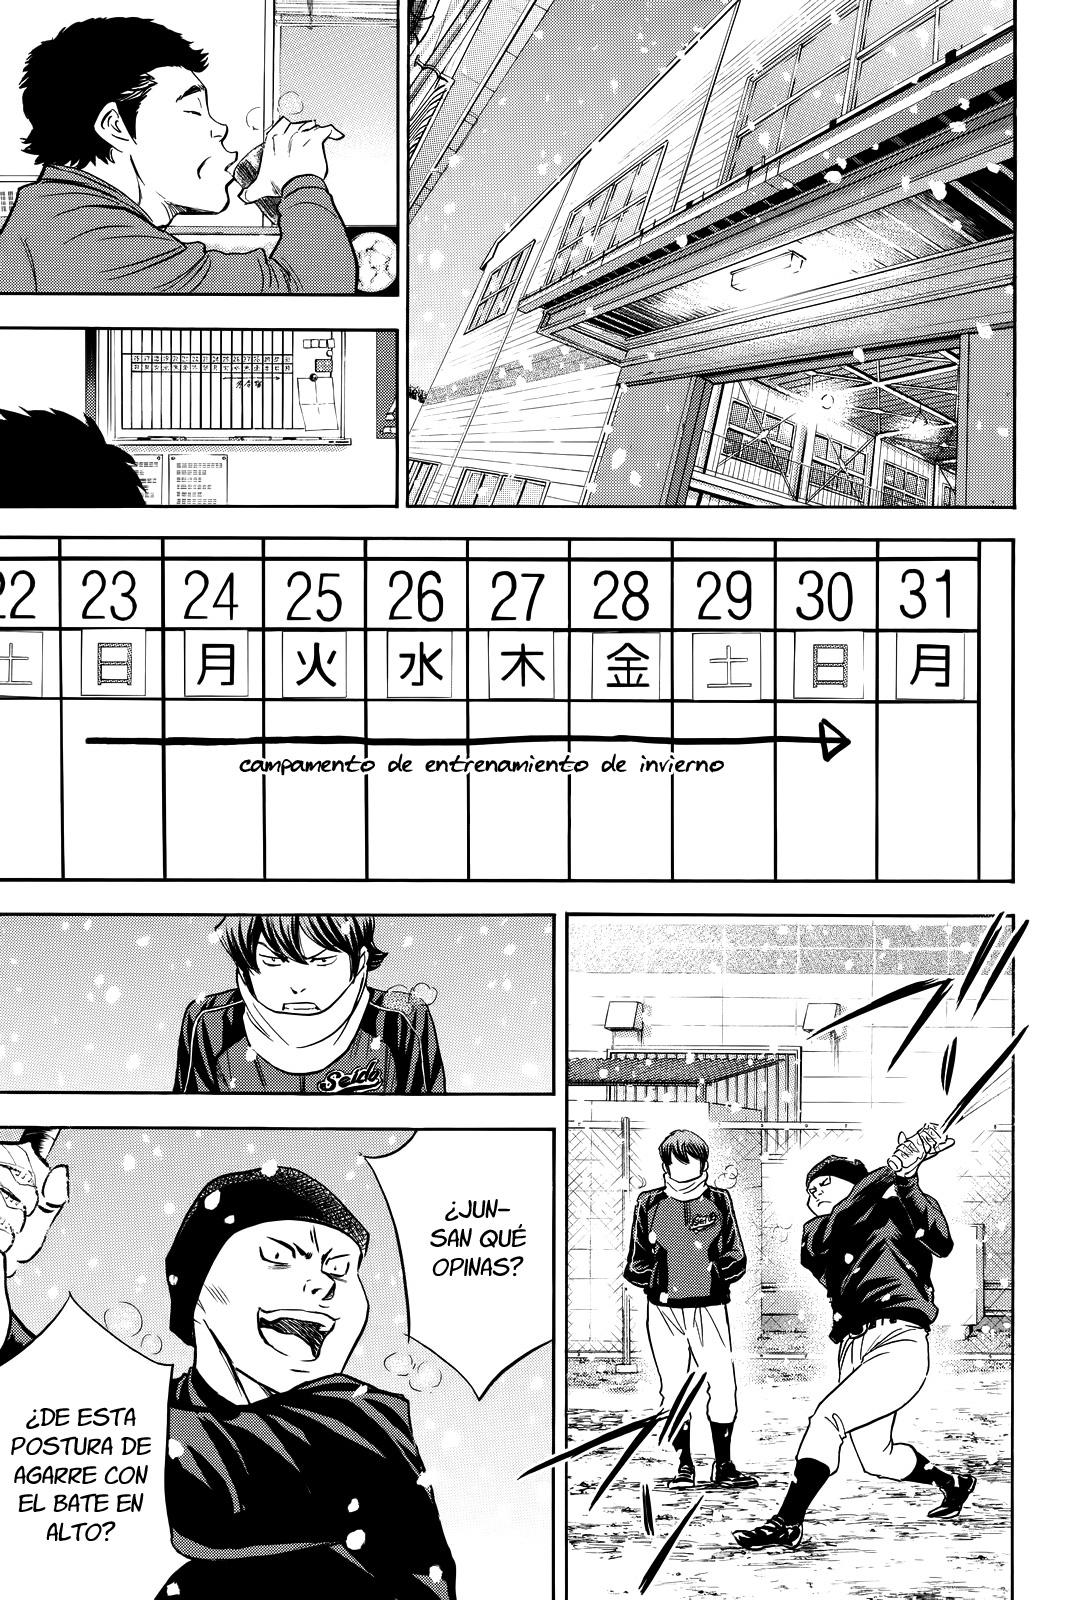 http://c5.ninemanga.com/es_manga/24/1752/416110/c74f59f3c6b610cc772e2e6f4a0cd124.jpg Page 22